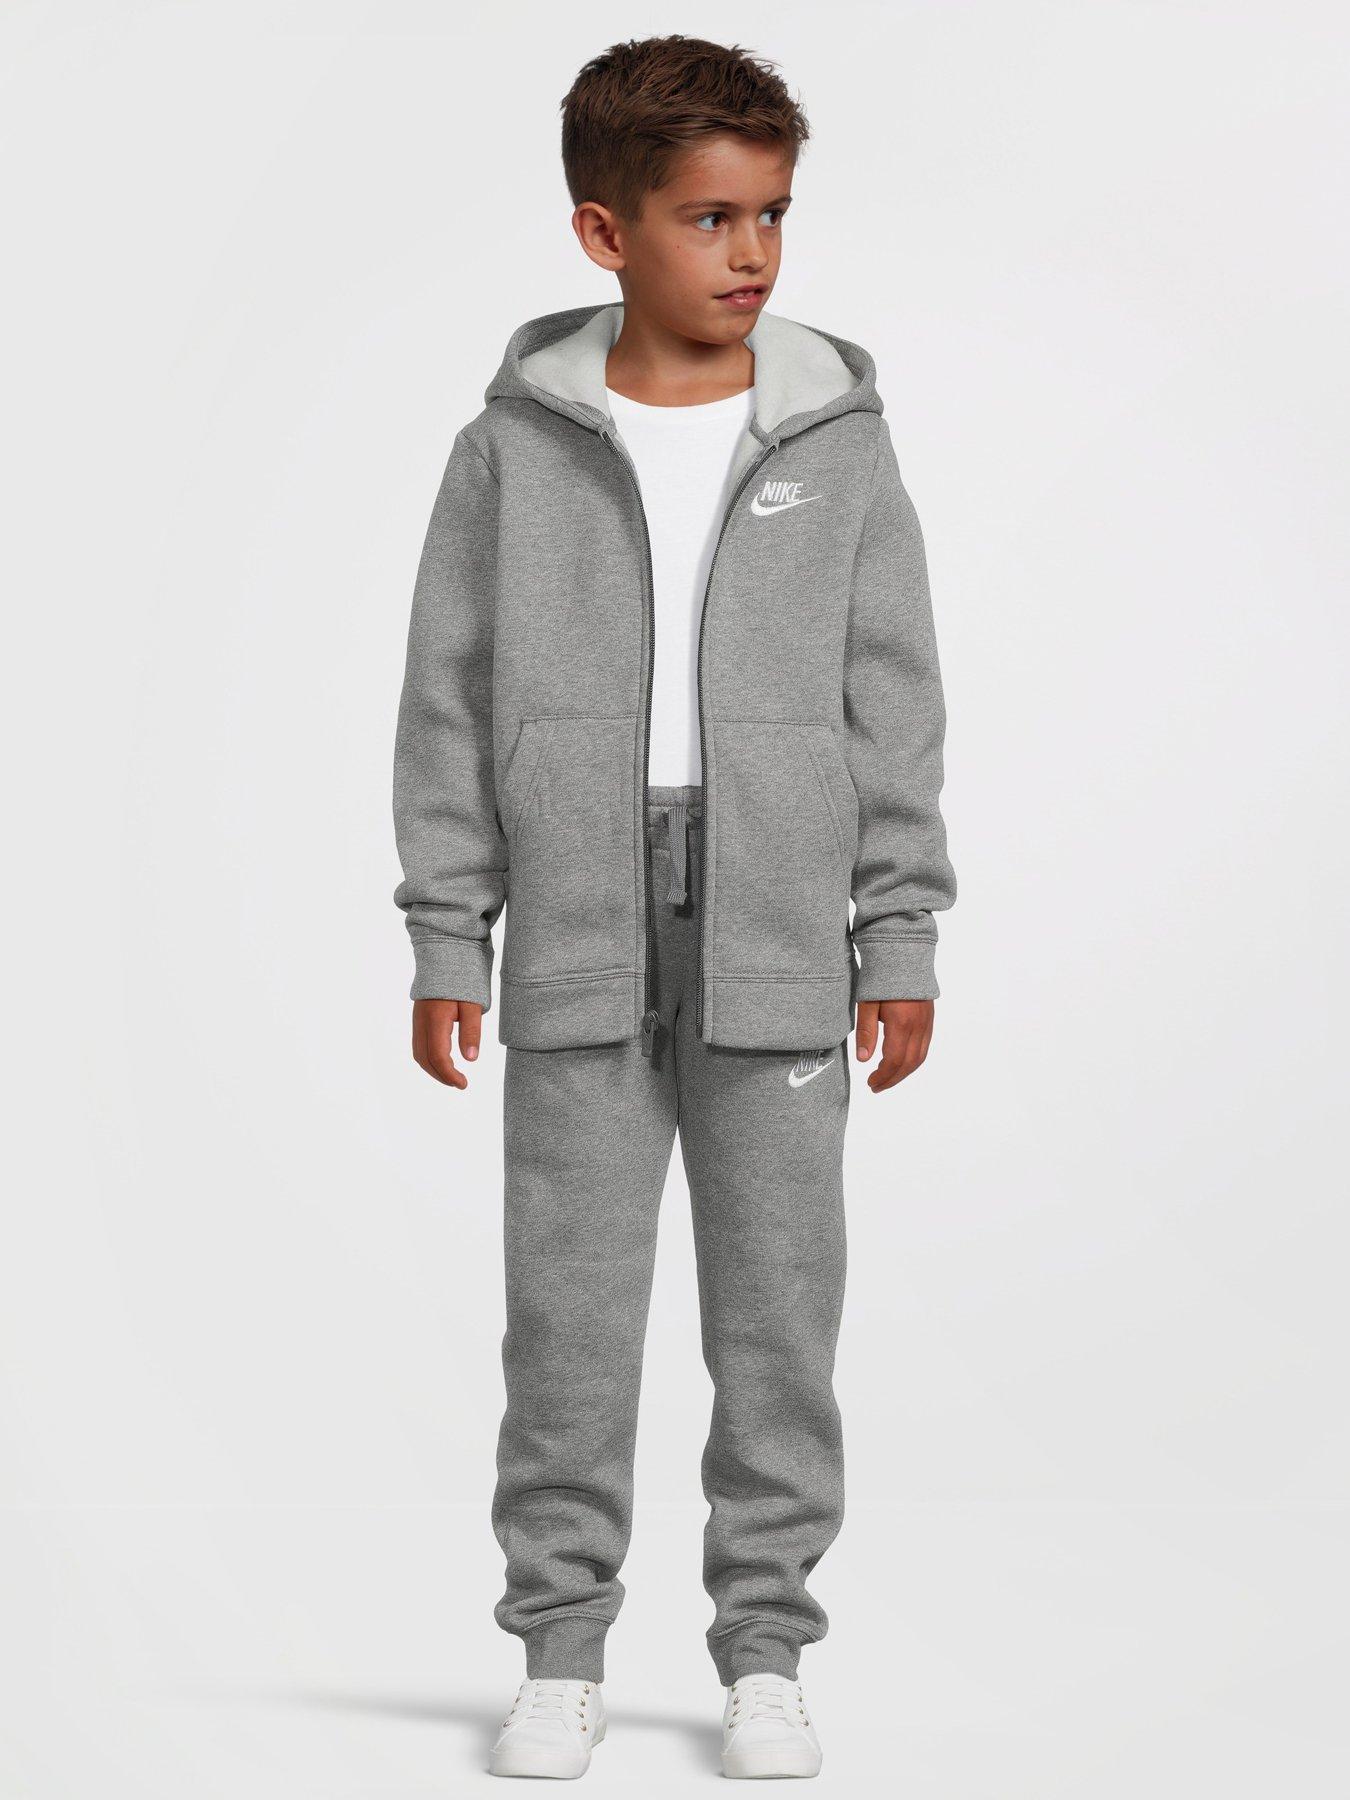 adidas Baby/_Boys Crew Jogger Tracksuit